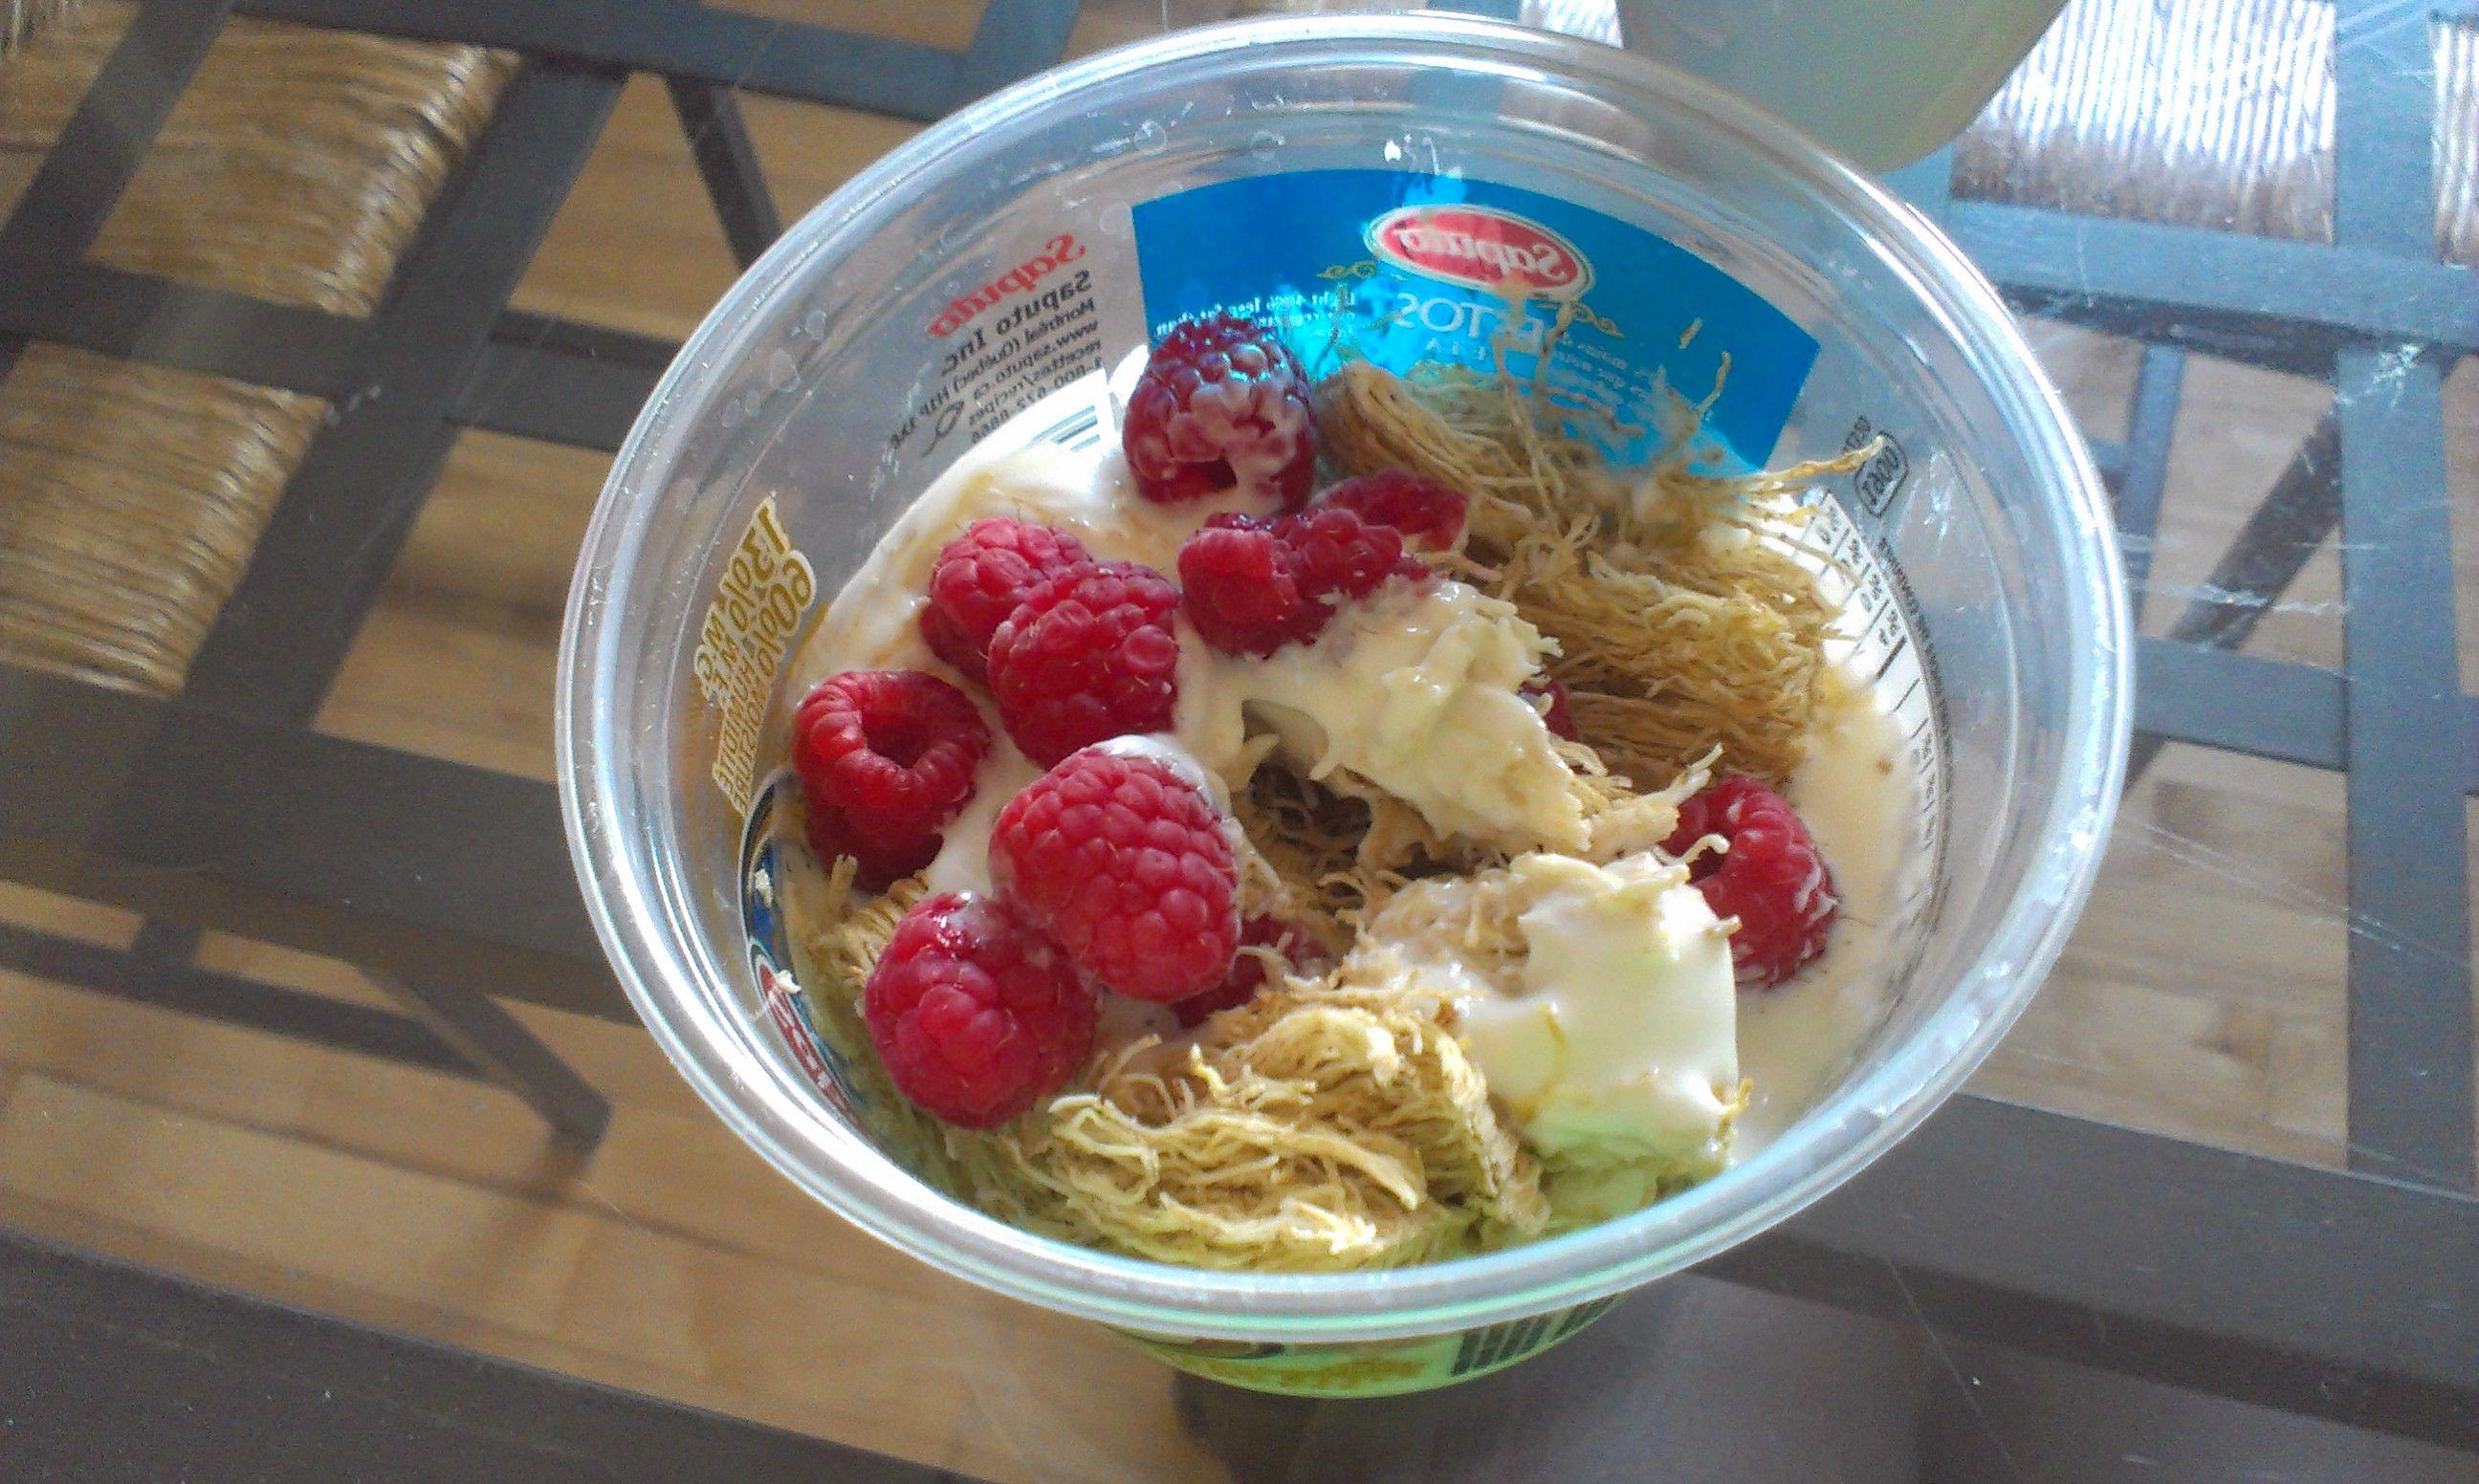 post whole wheat biscuit, raspberries, greek yogurt